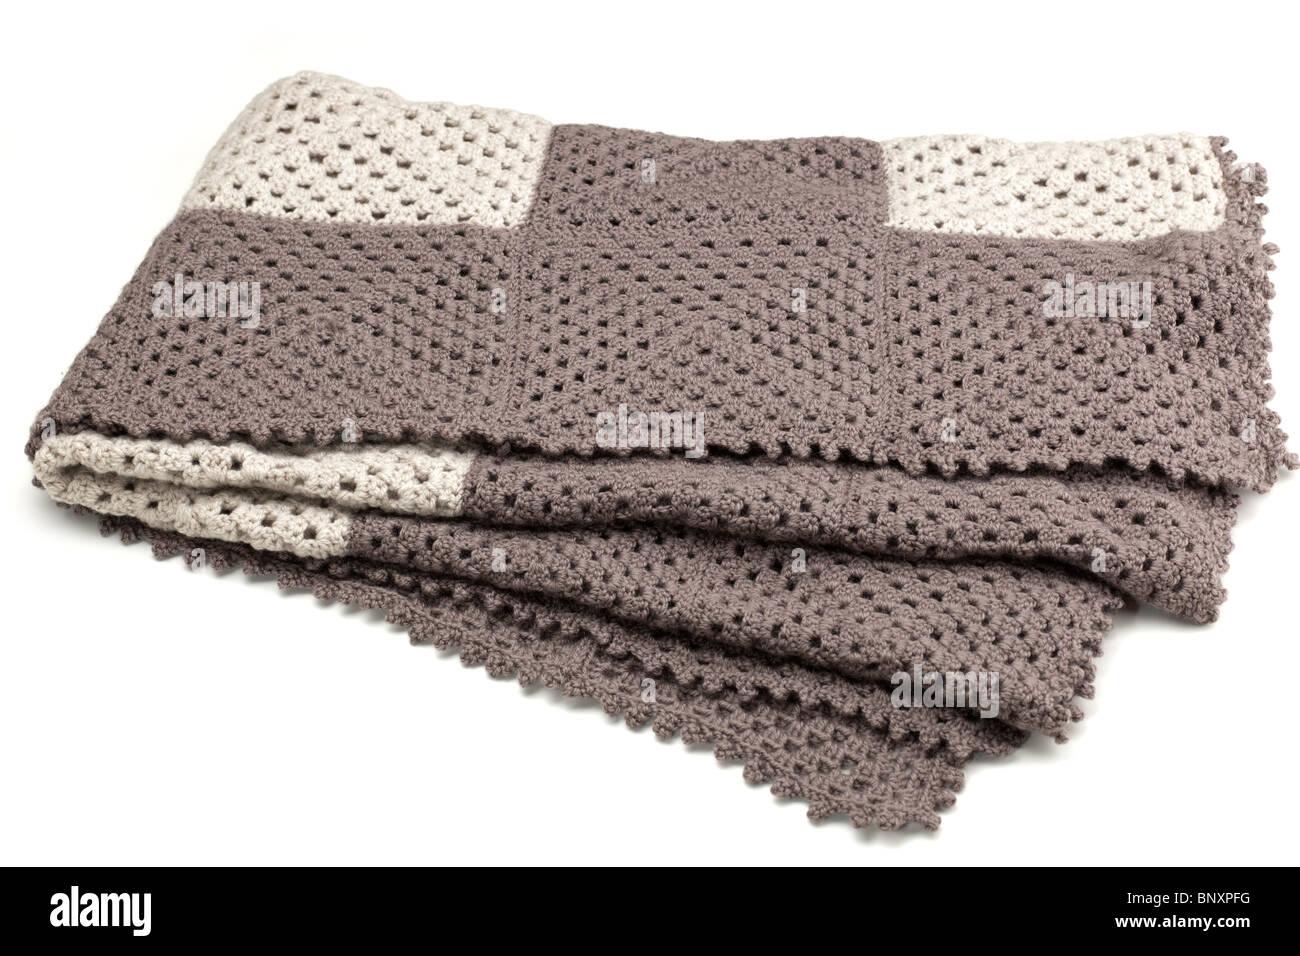 Crocheted blanket - Stock Image